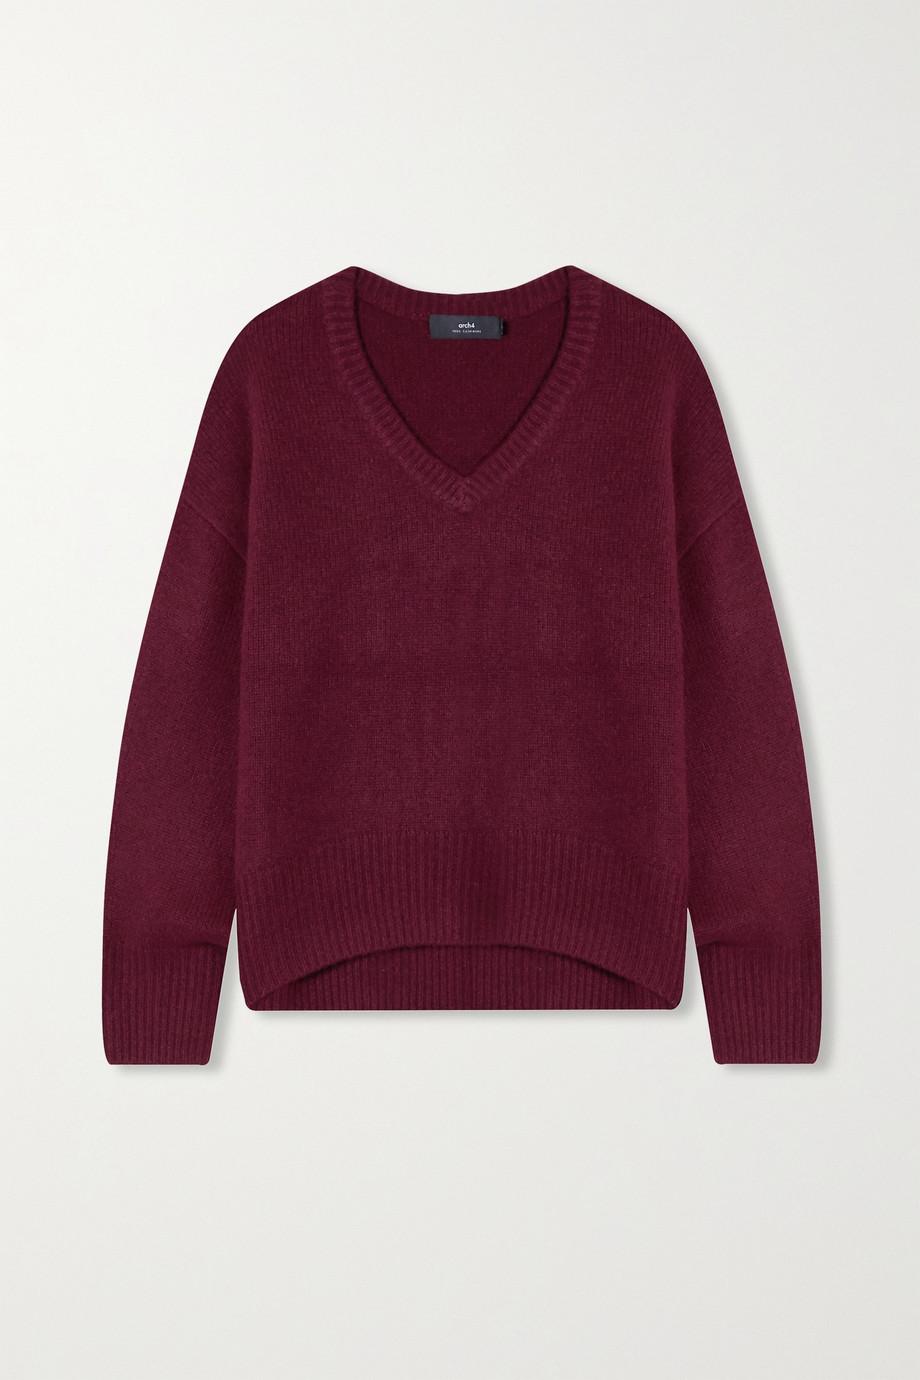 Arch4 Battersea cashmere sweater